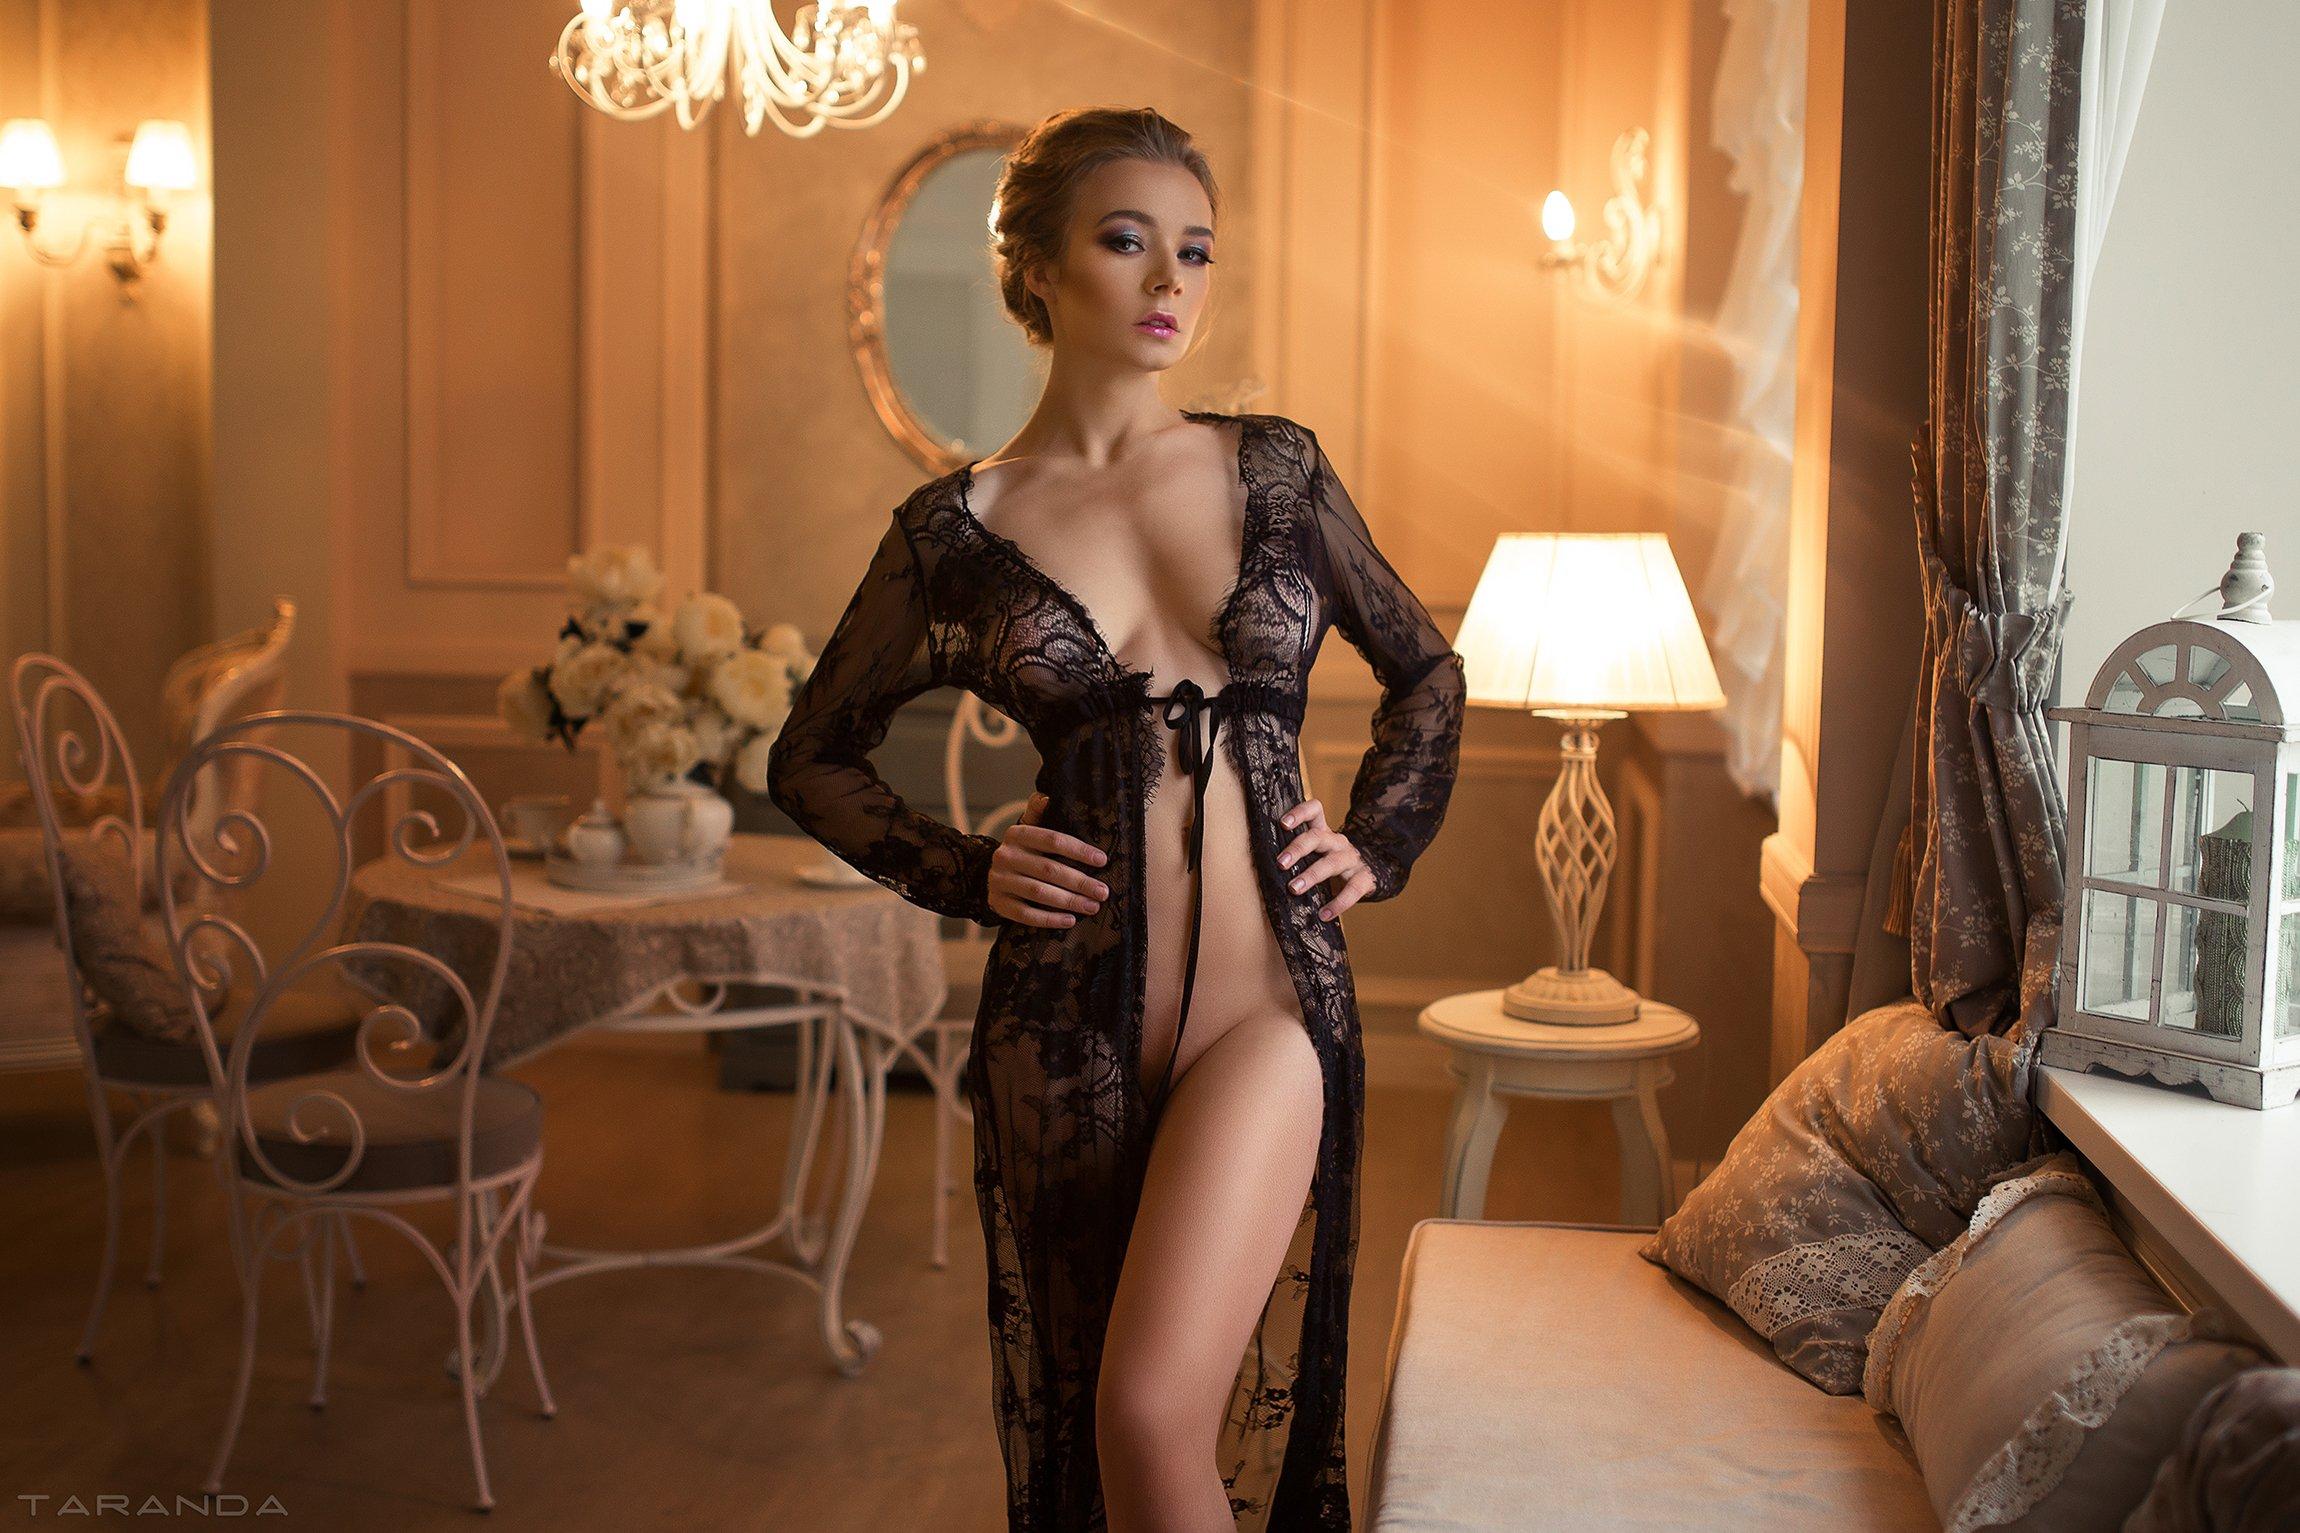 girl, kiev, ukraine, xxl, studio, nude, sweet, light, sexy, eyes, beauty, Тарас Таранда